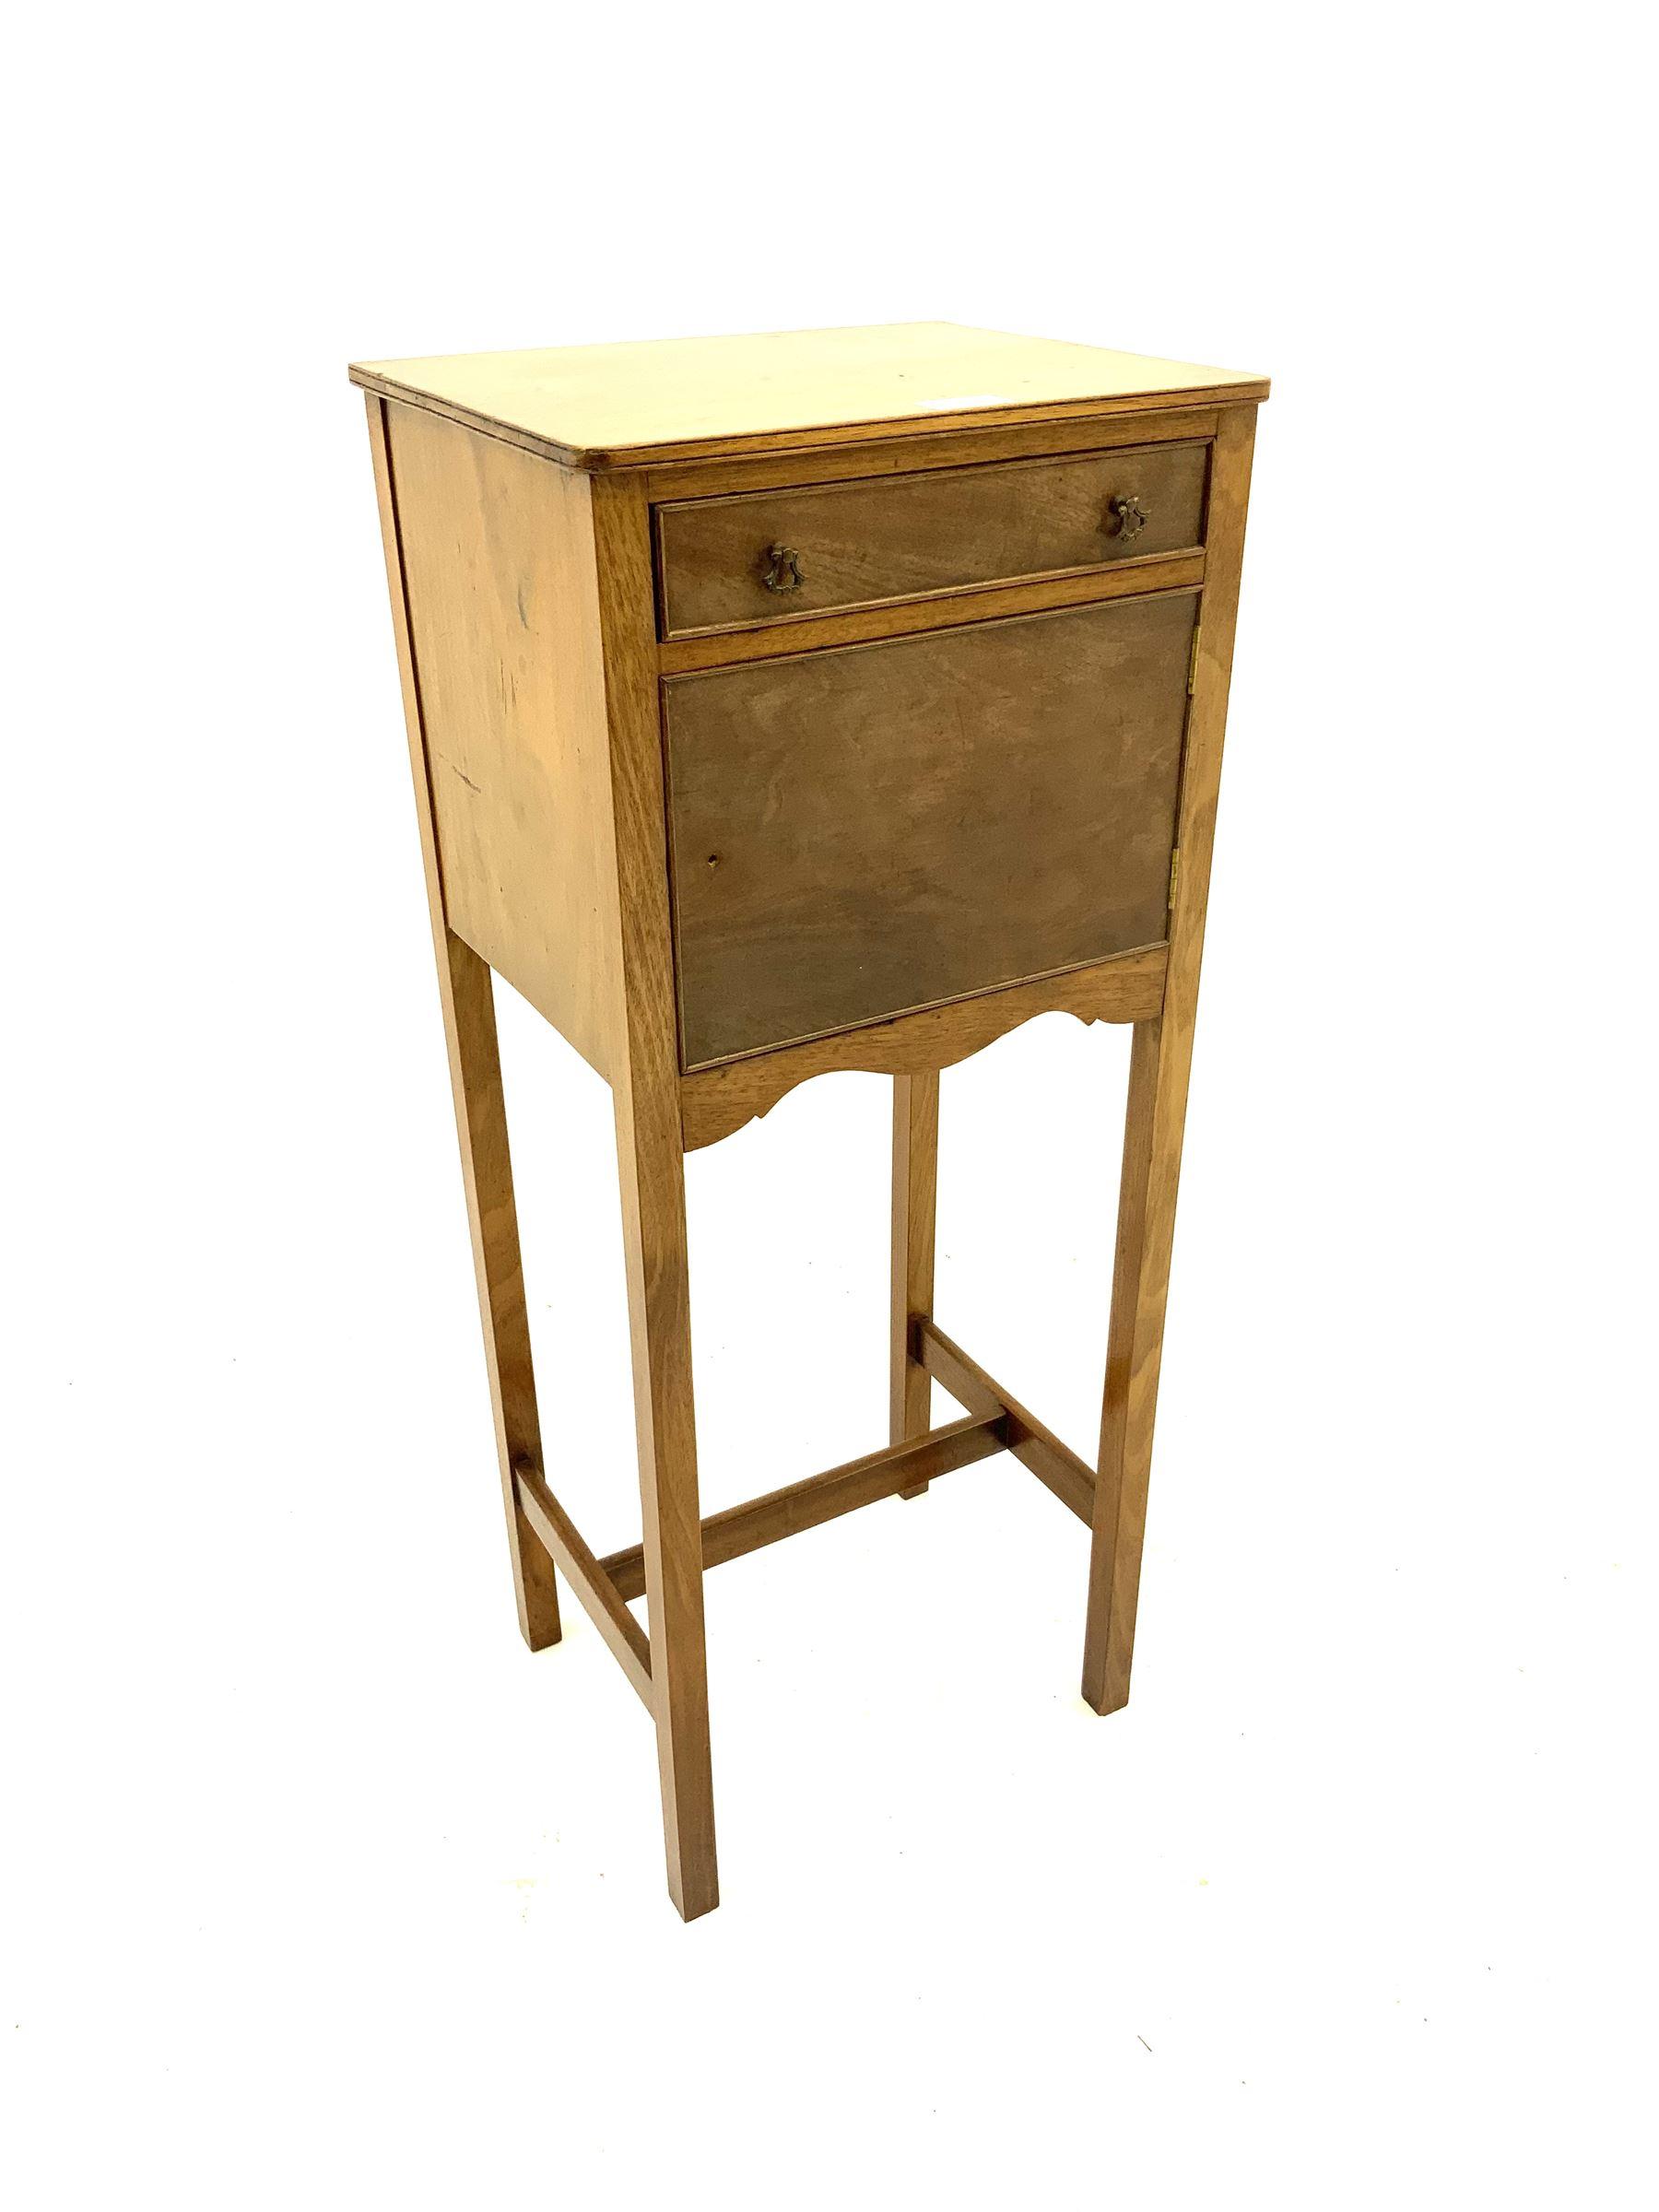 Early 20th century mahogany bedside pot cupboard